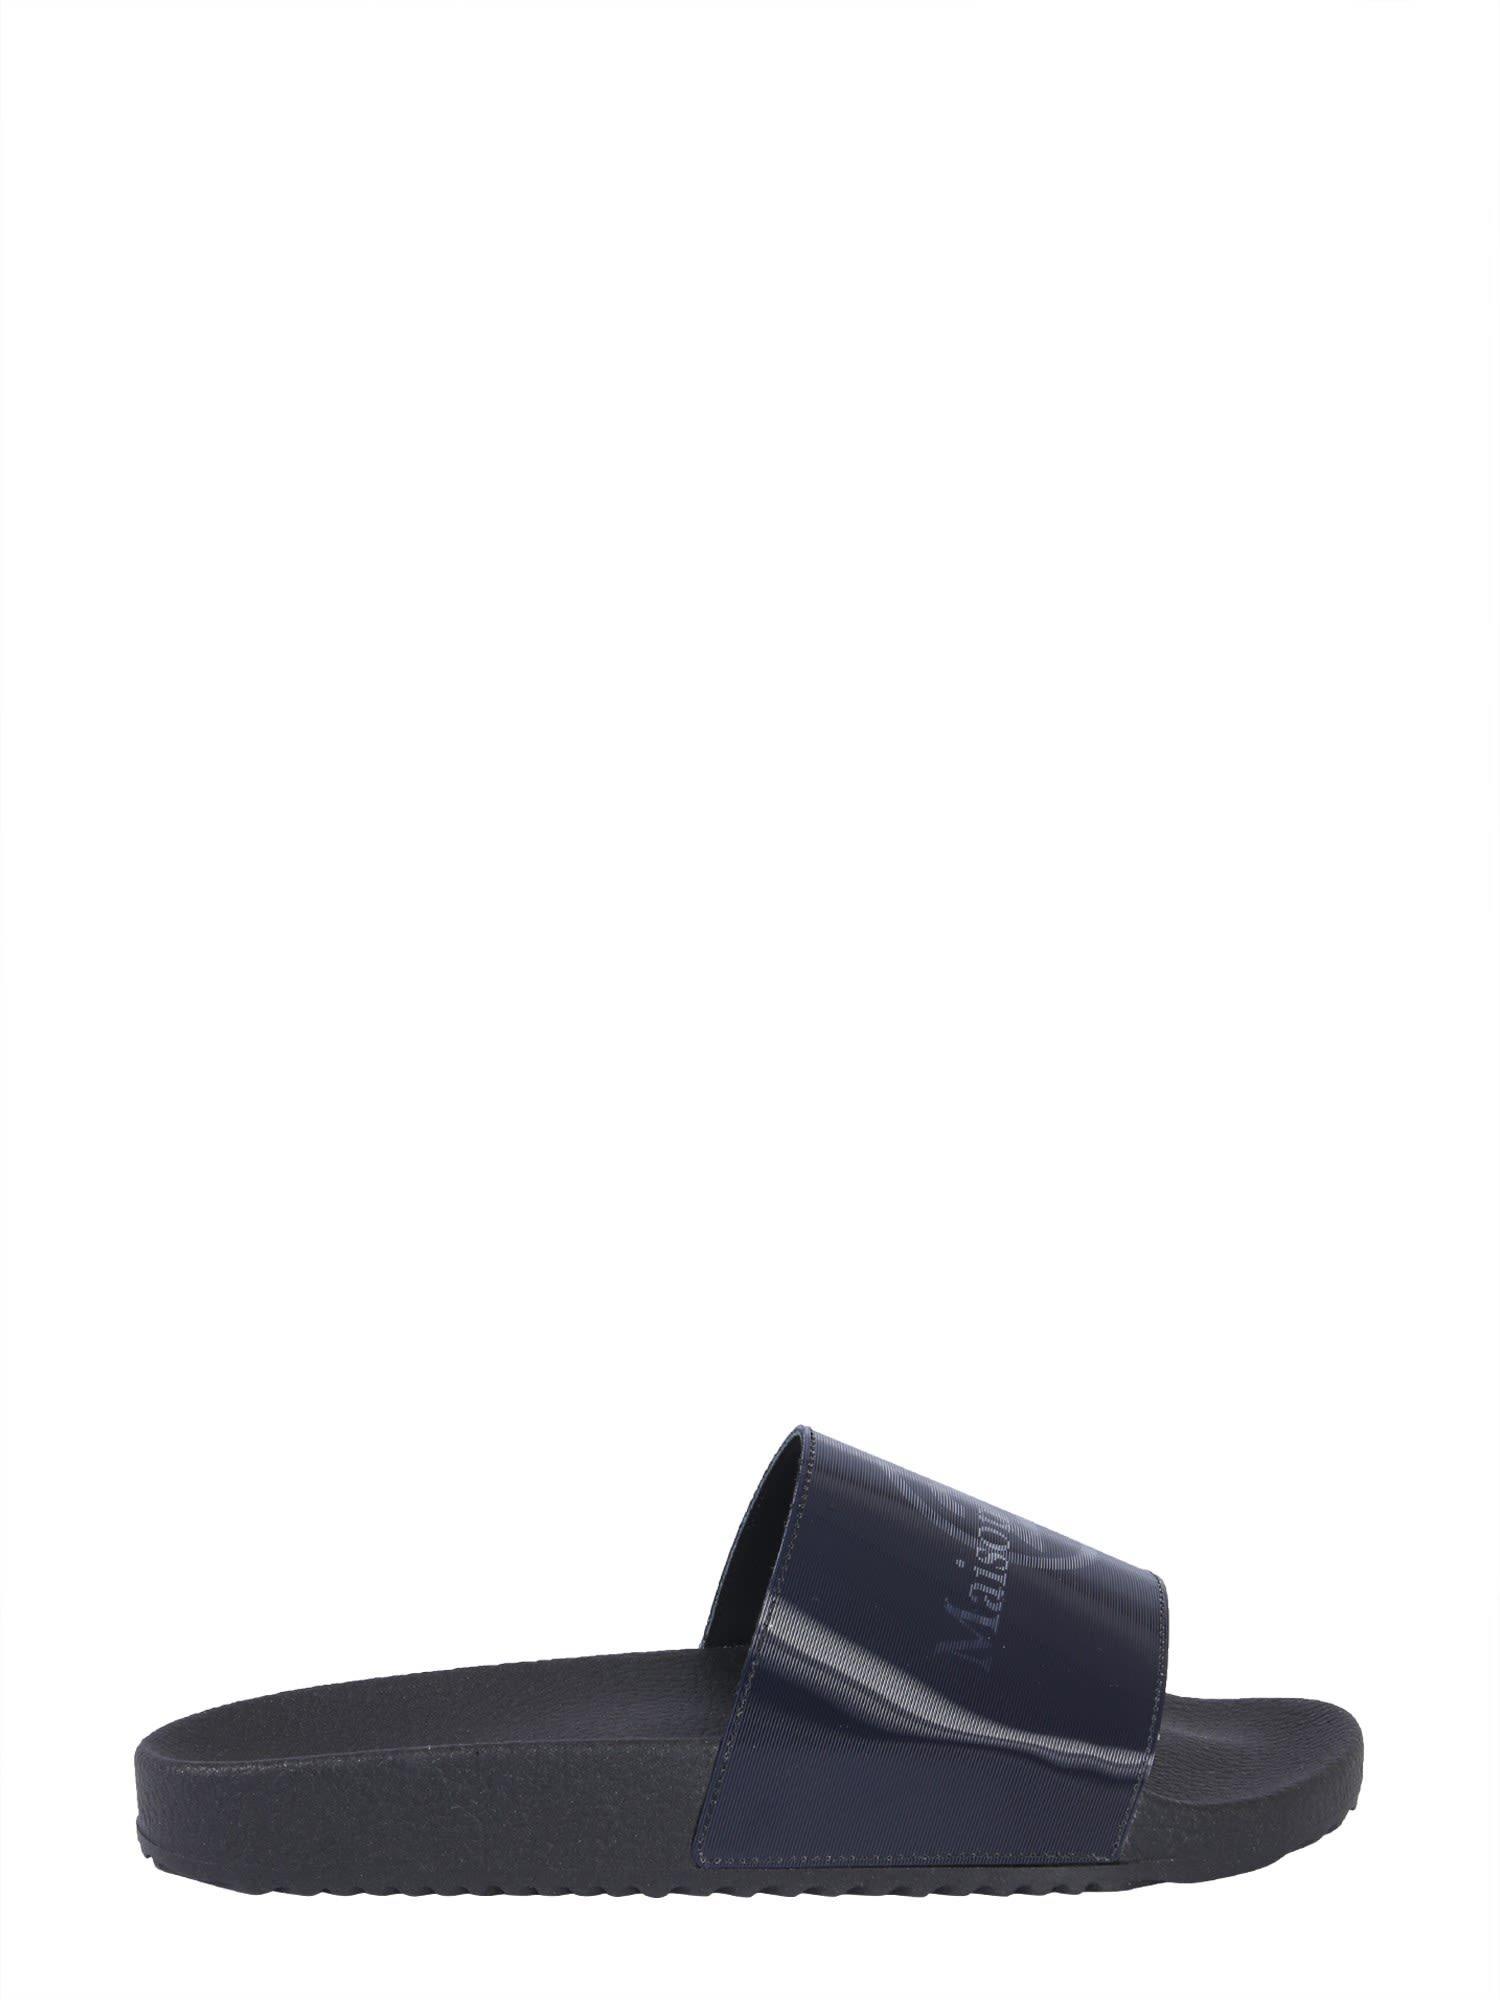 Maison Margiela Slide Sandals